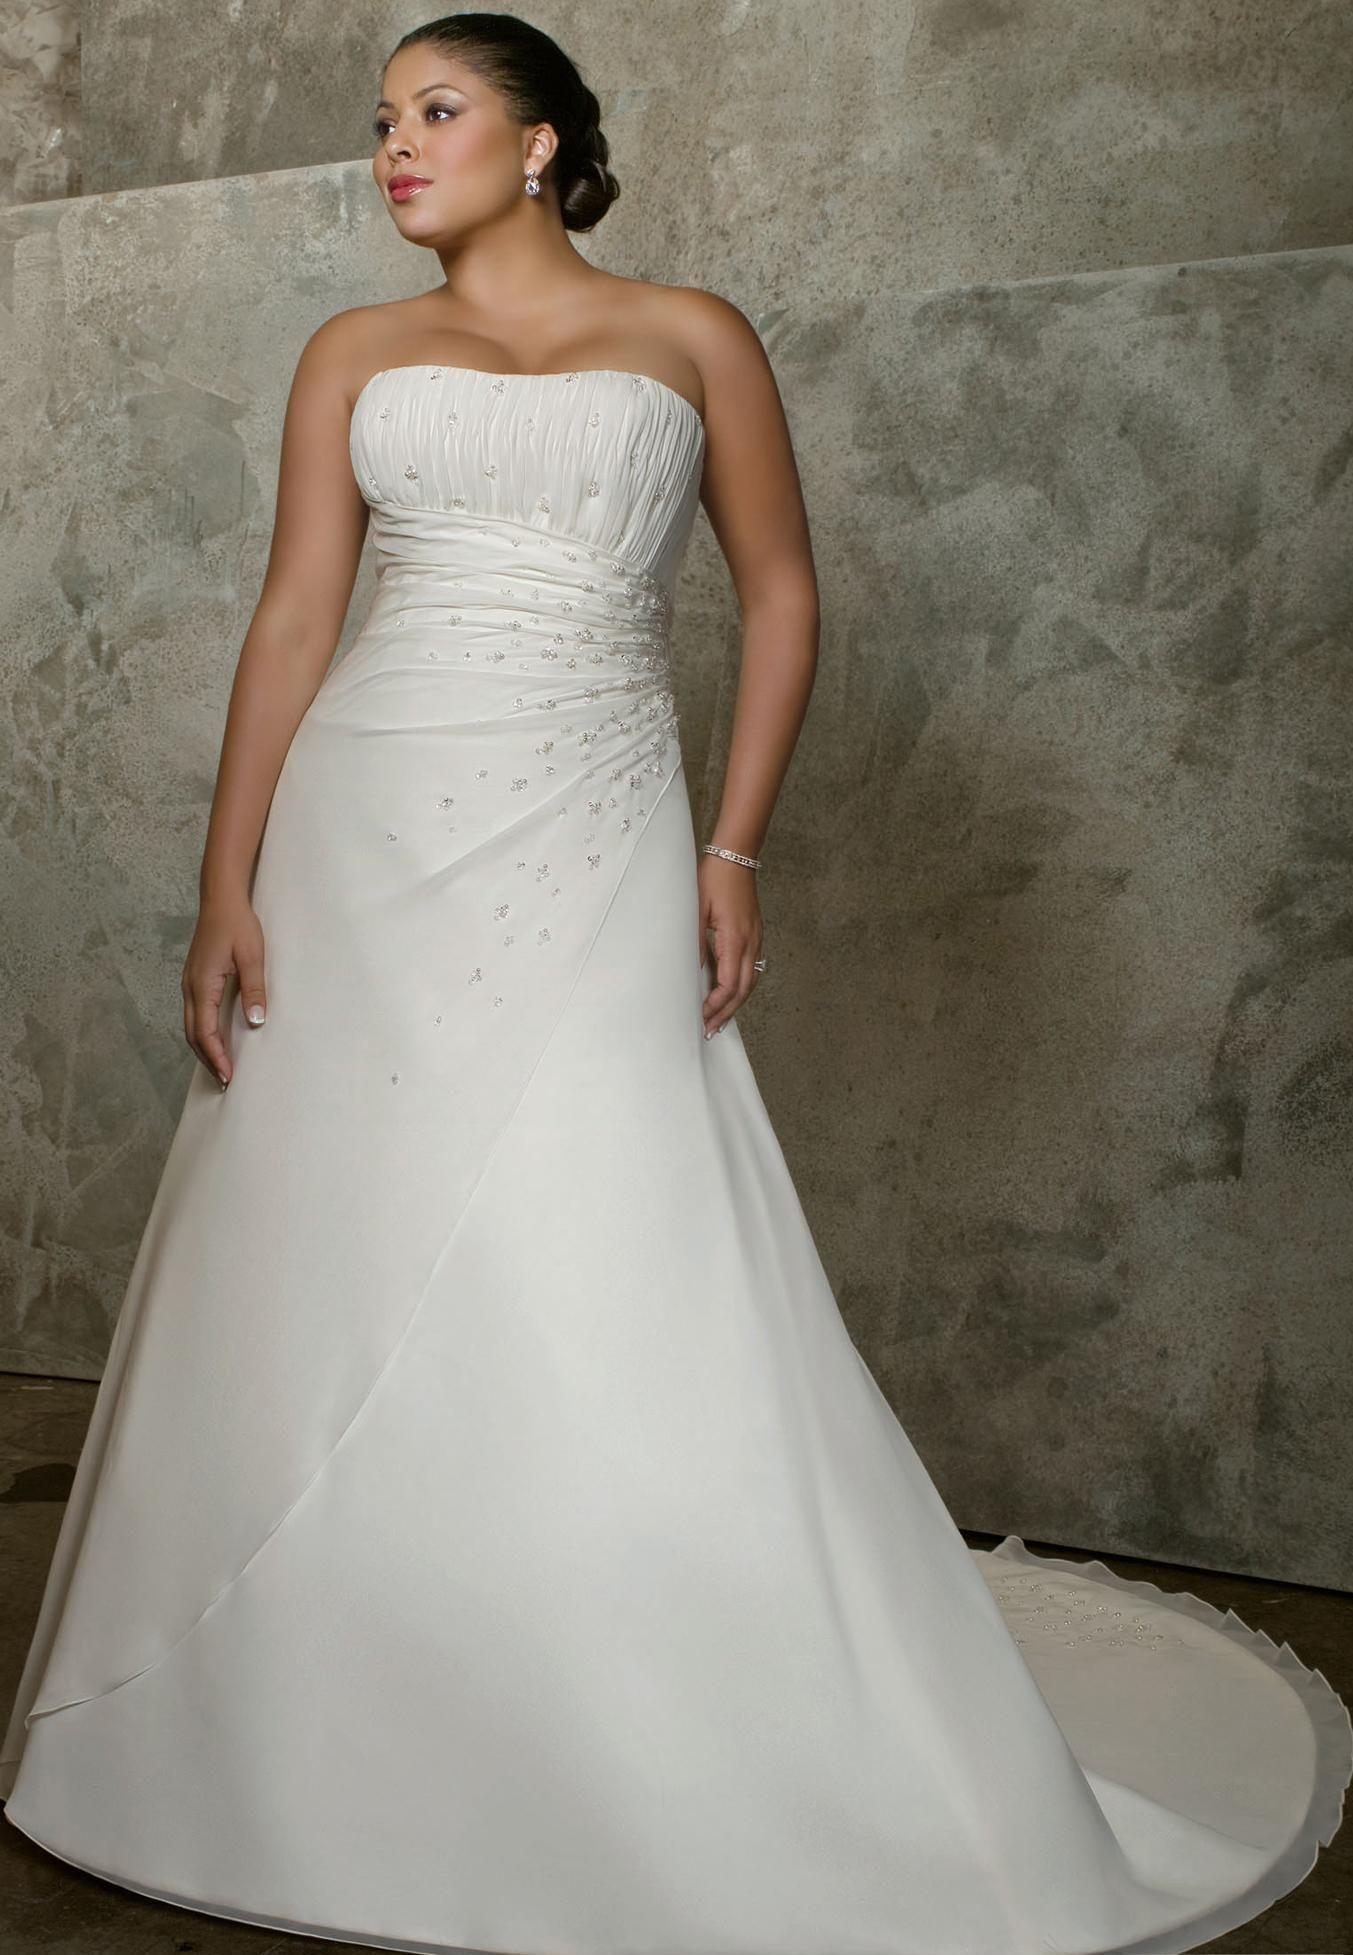 Plus size bling wedding dresses  wedding dresses princess wedding dresses bling wedding dresses with